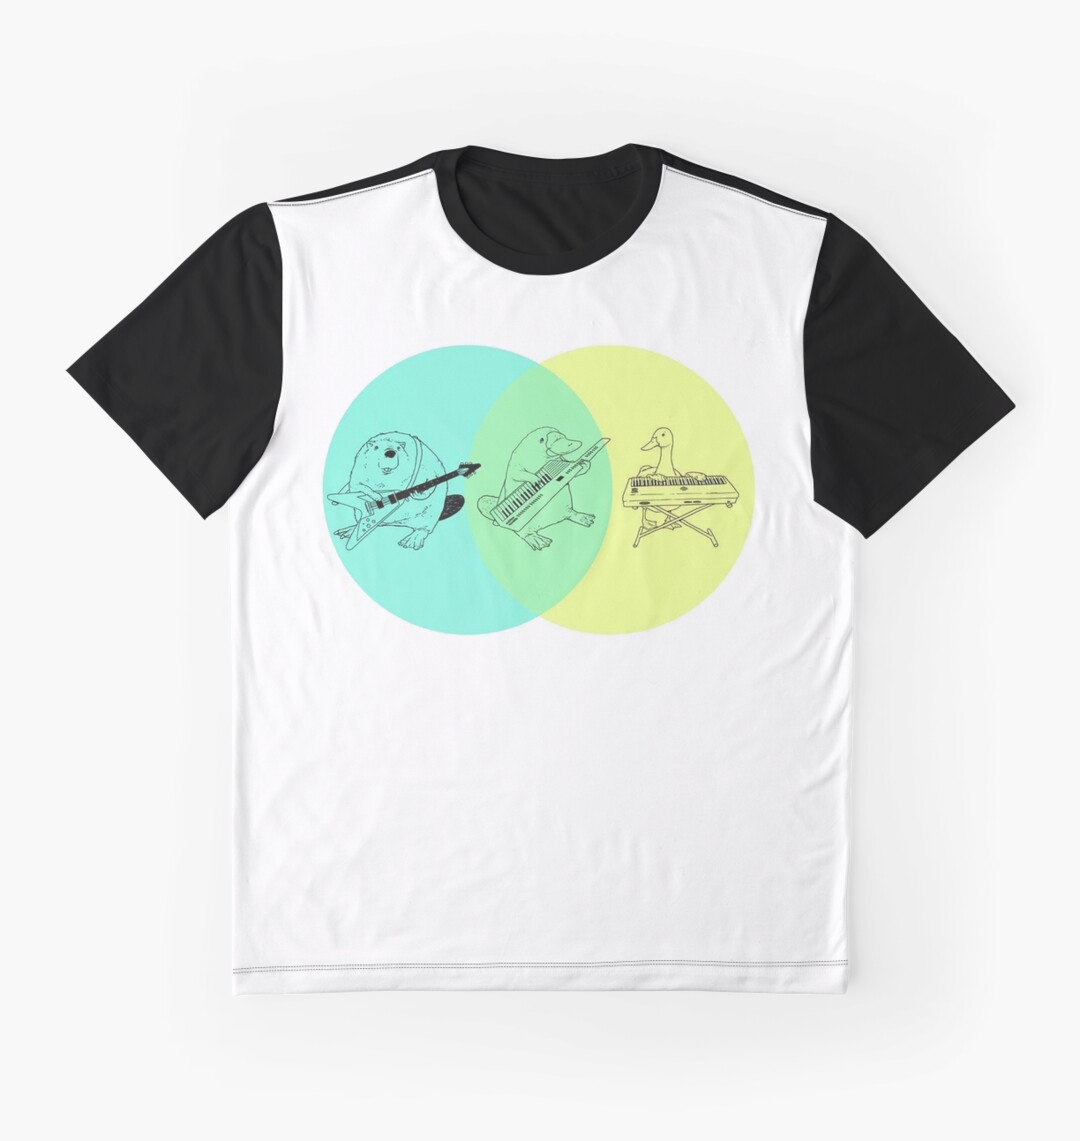 Keytar platypus venn diagram grafik t shirts von guyblank redbubble keytar platypus venn diagram pooptronica